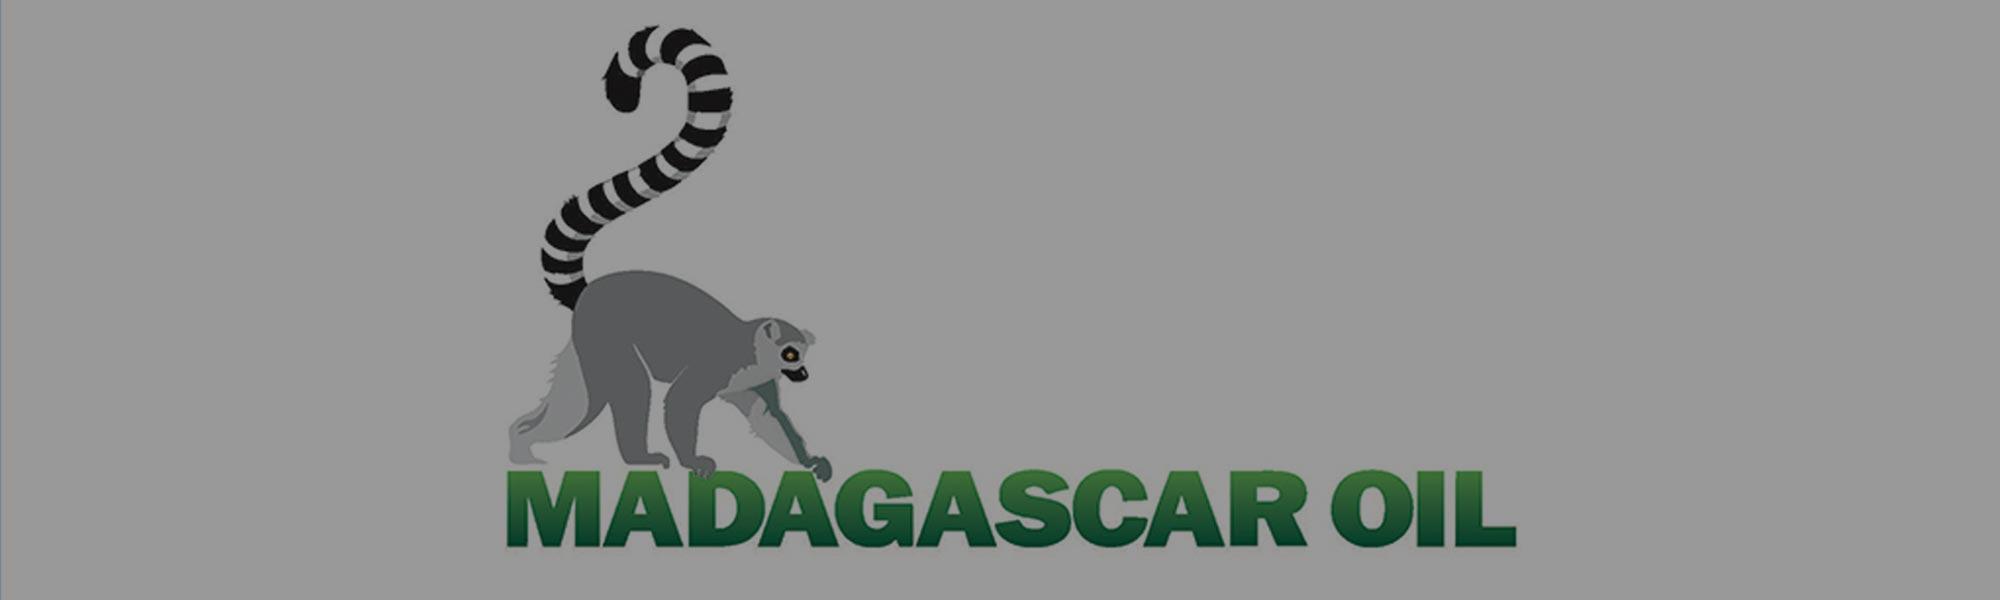 Madagascar Oil and Caspian Sea Project